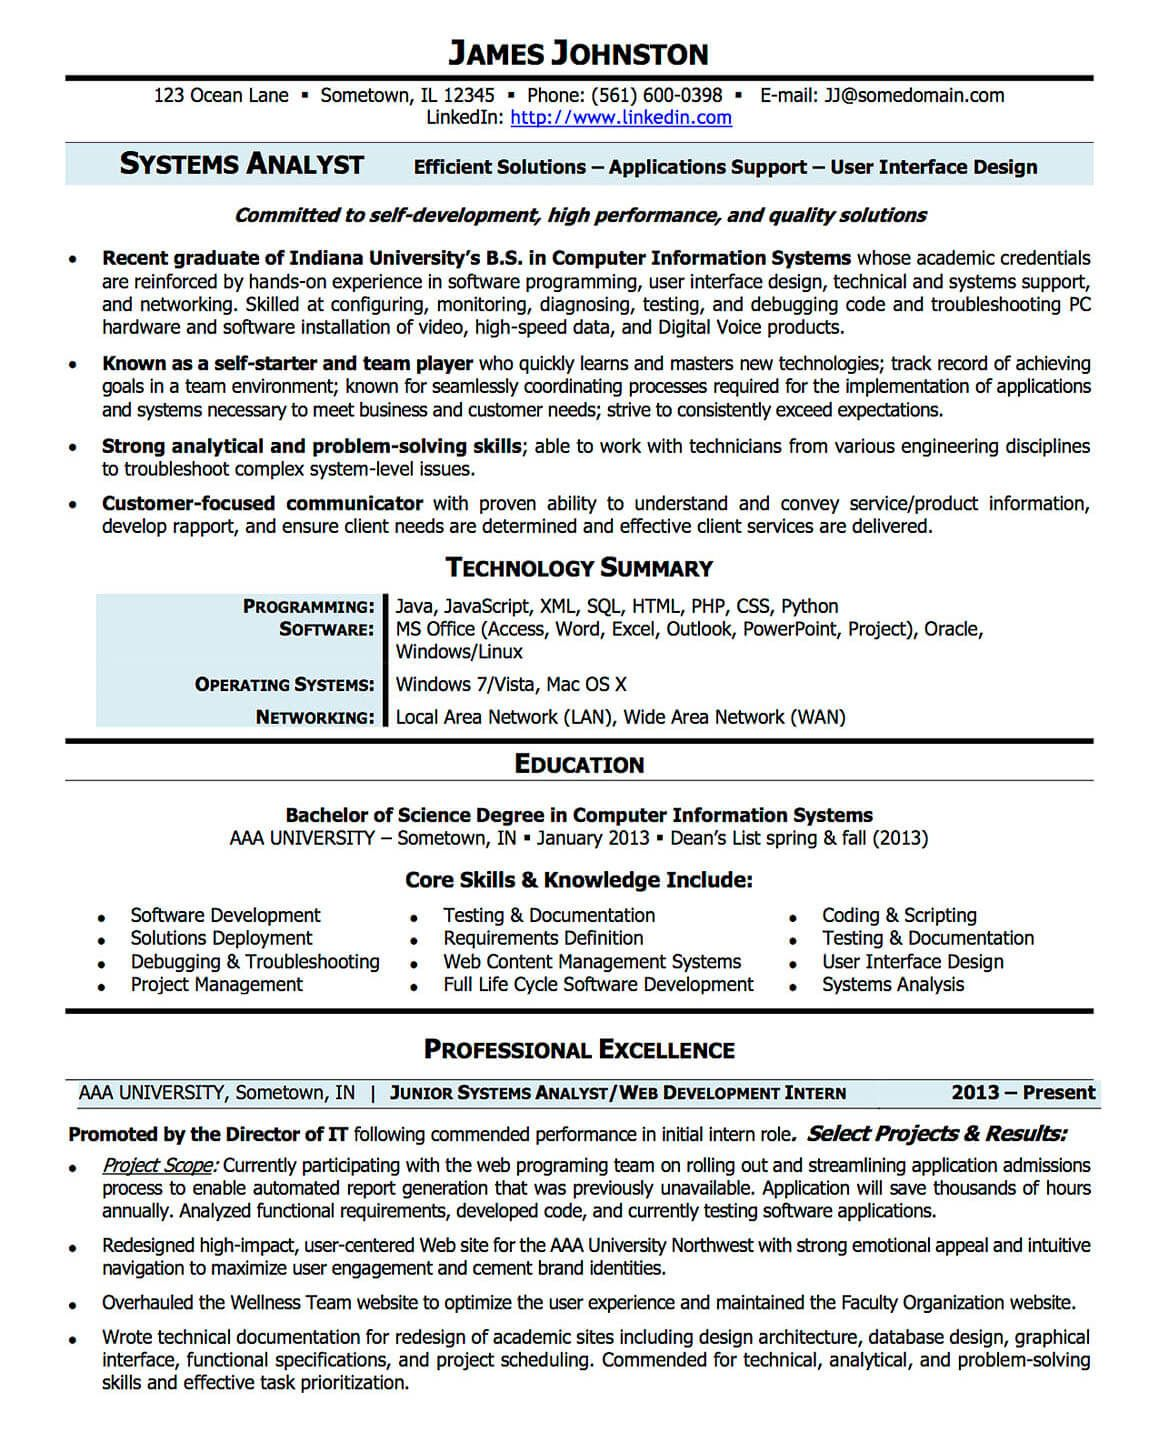 Resume Examples Cv Sample Templates Rso Resumes